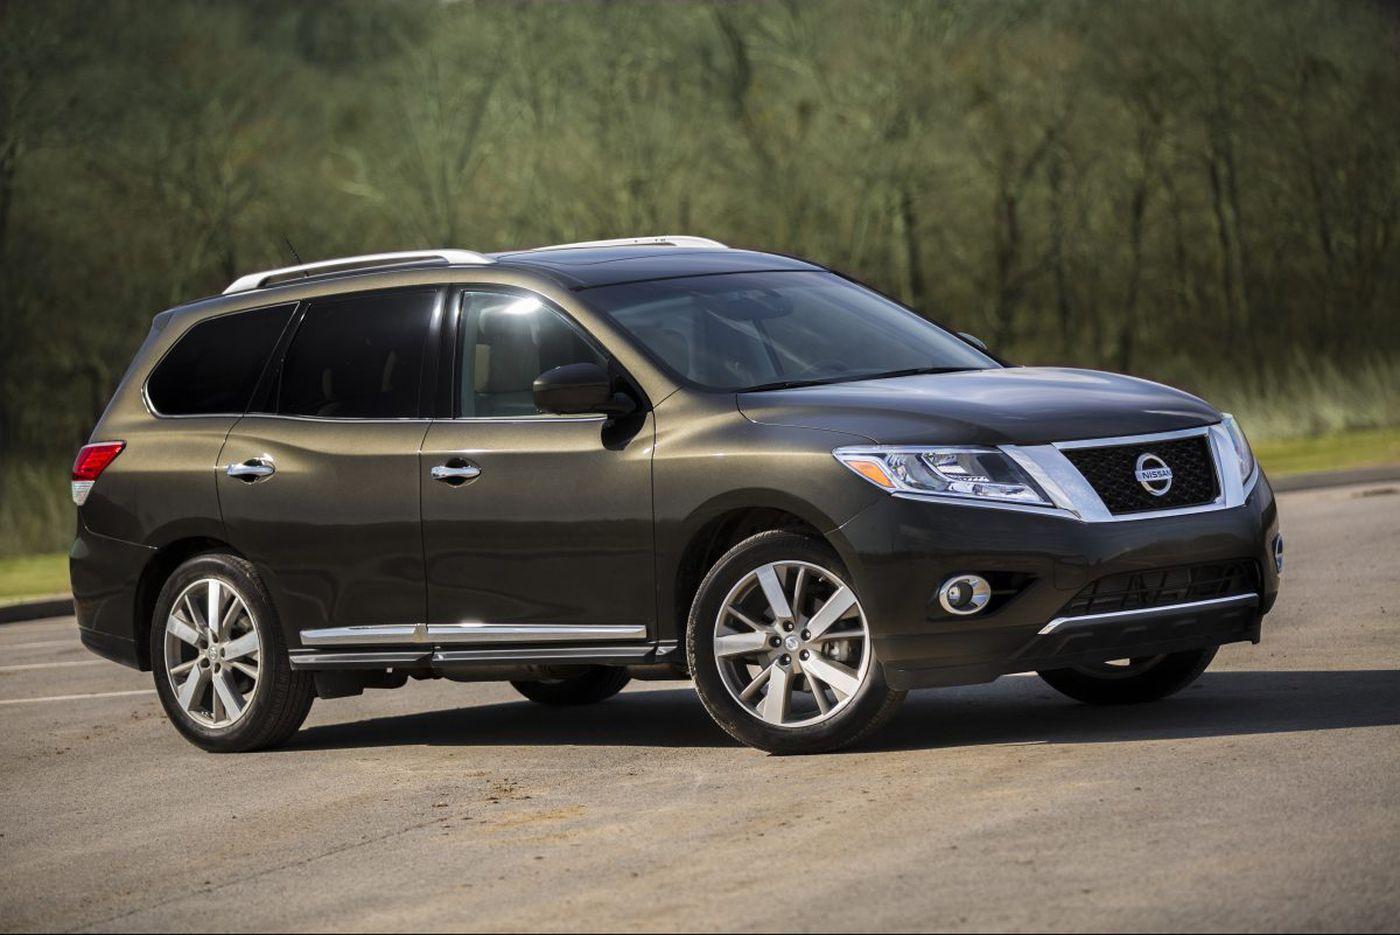 """Test driving"" a 2016 Nissan Pathfinder S rental"